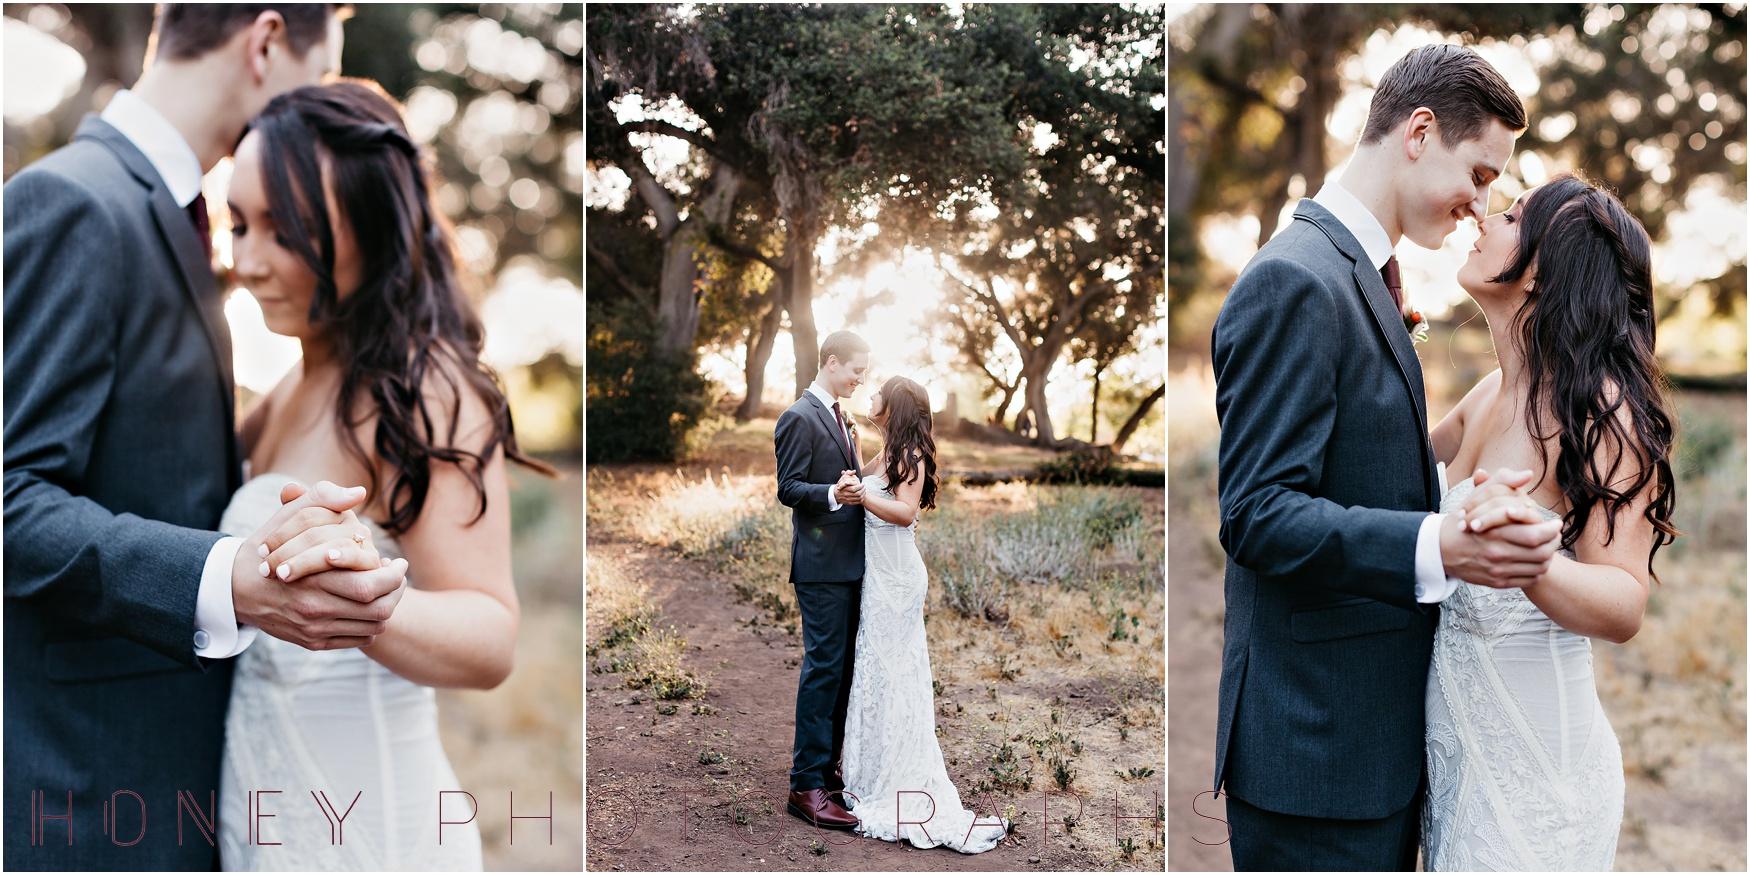 picnic-wedding-rustic-sweetheart-table-felicita-park-boho27.jpg